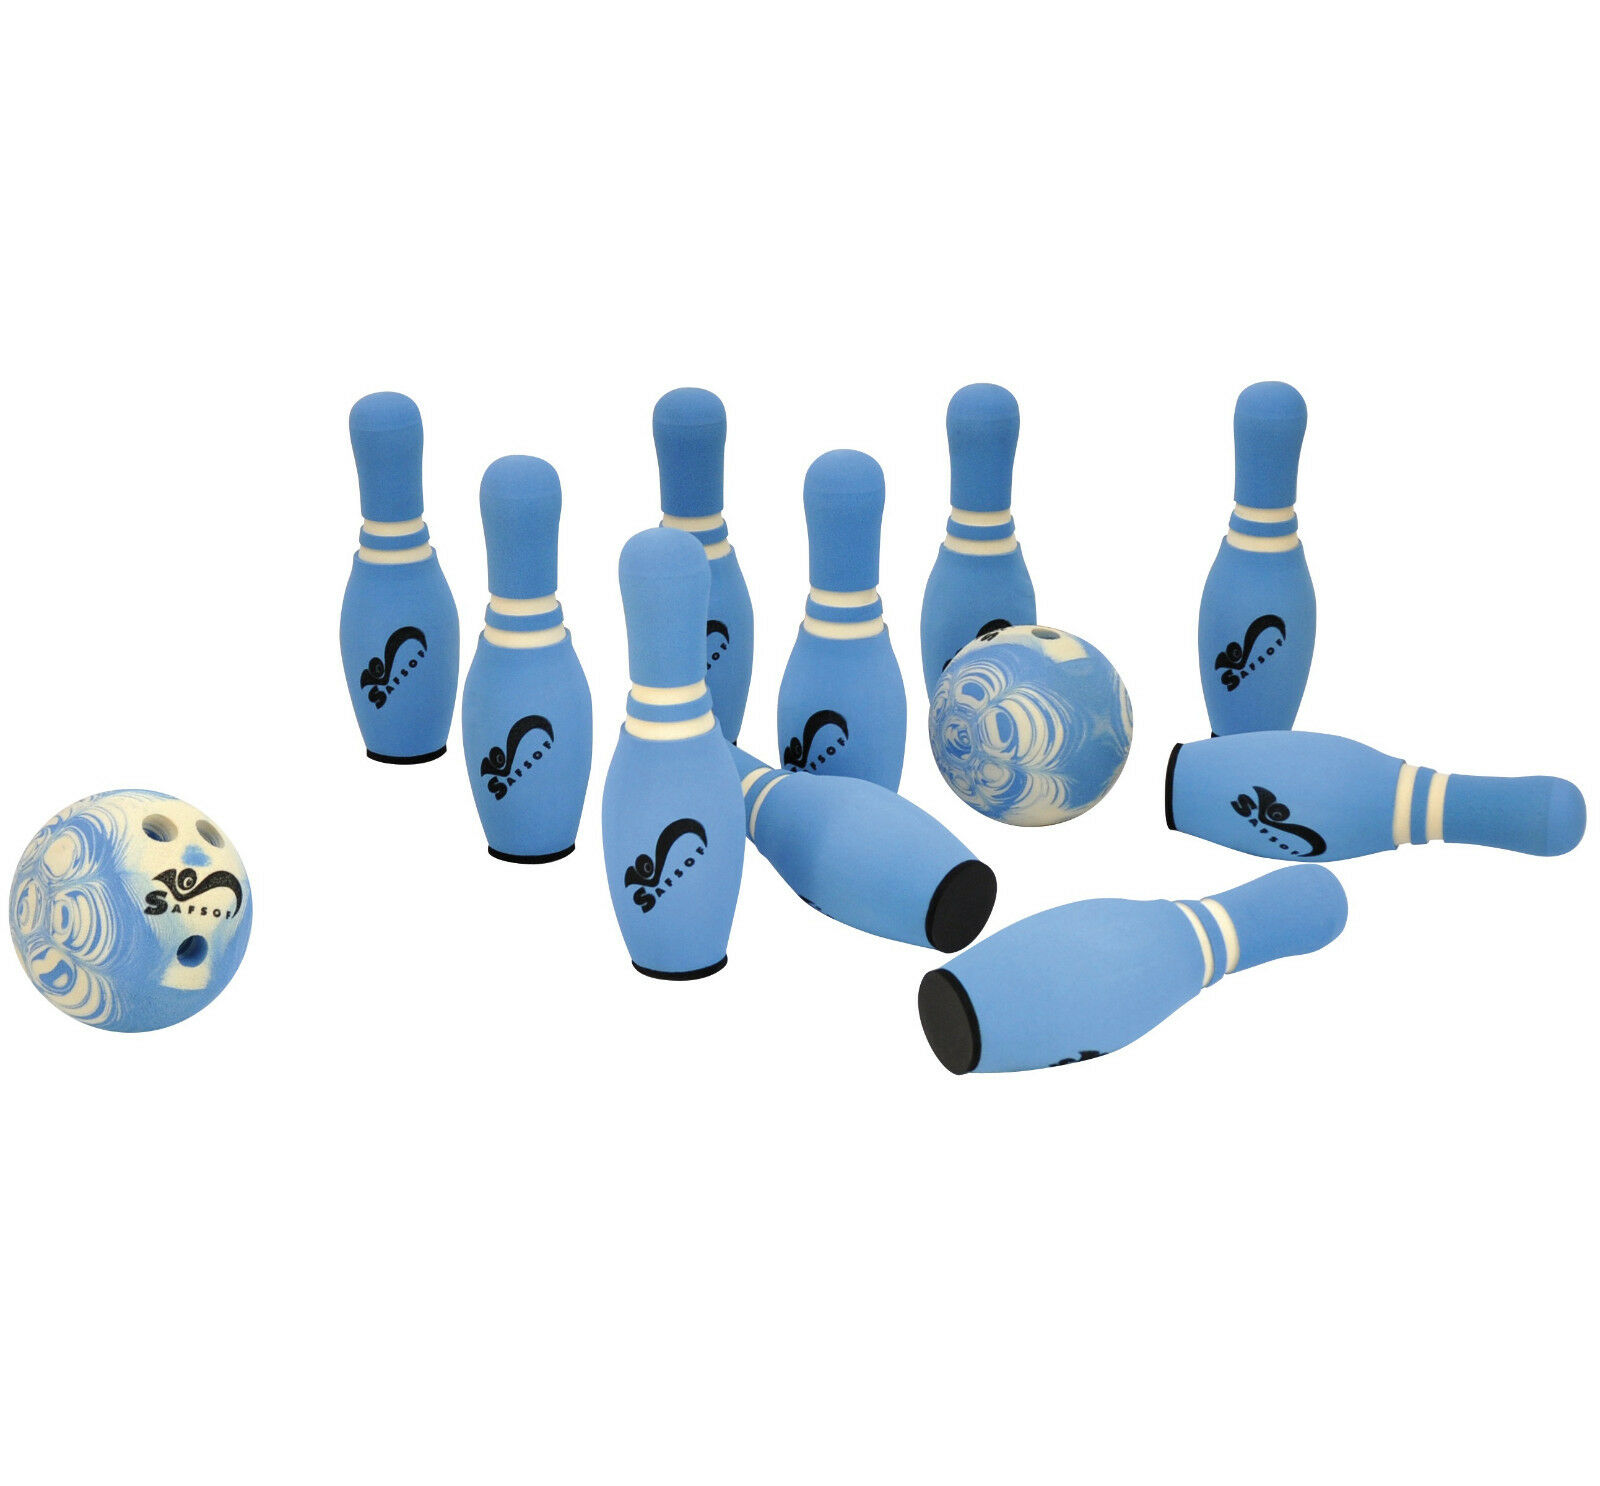 EDUPLAY Kinder Soft Bowling 10 Kegel 34 cm    2 Kugeln Ø 17,5 cm Set 12-teilig NEU 2aaf34